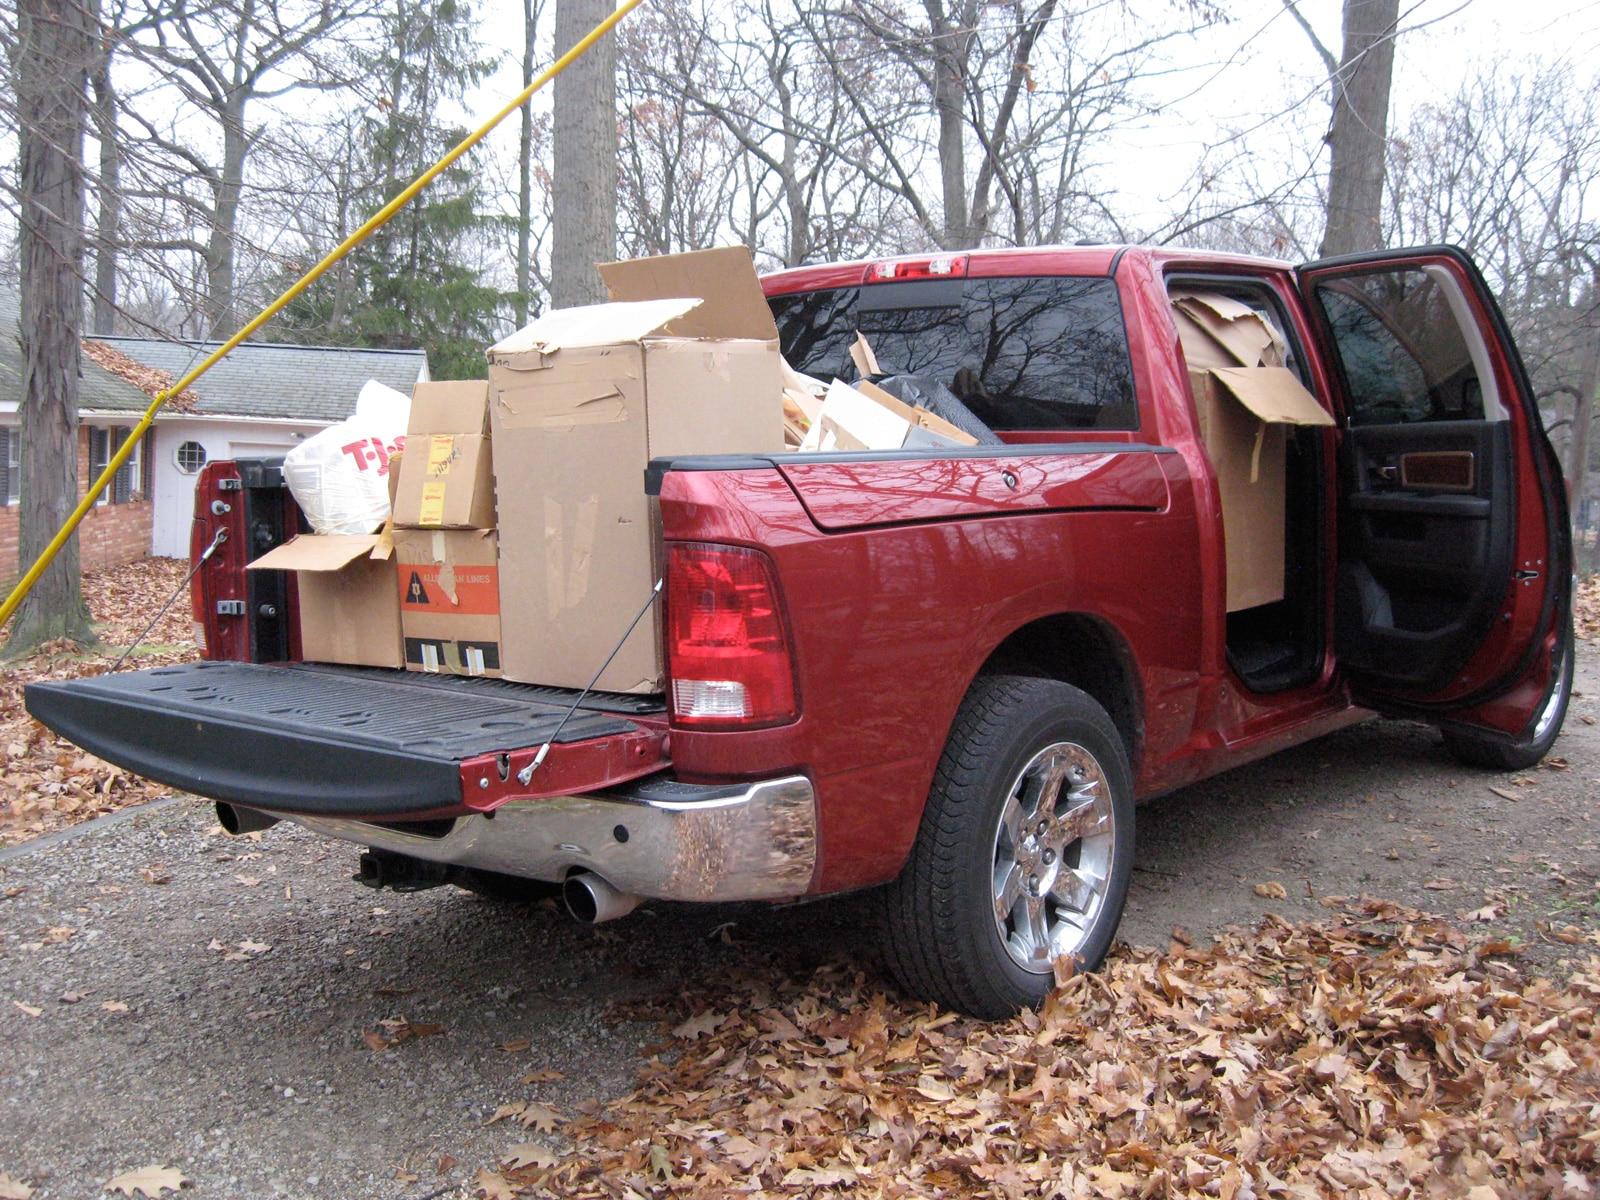 0912 01 Z 2009 Dodge Ram 1500 Rear Three Quarter View